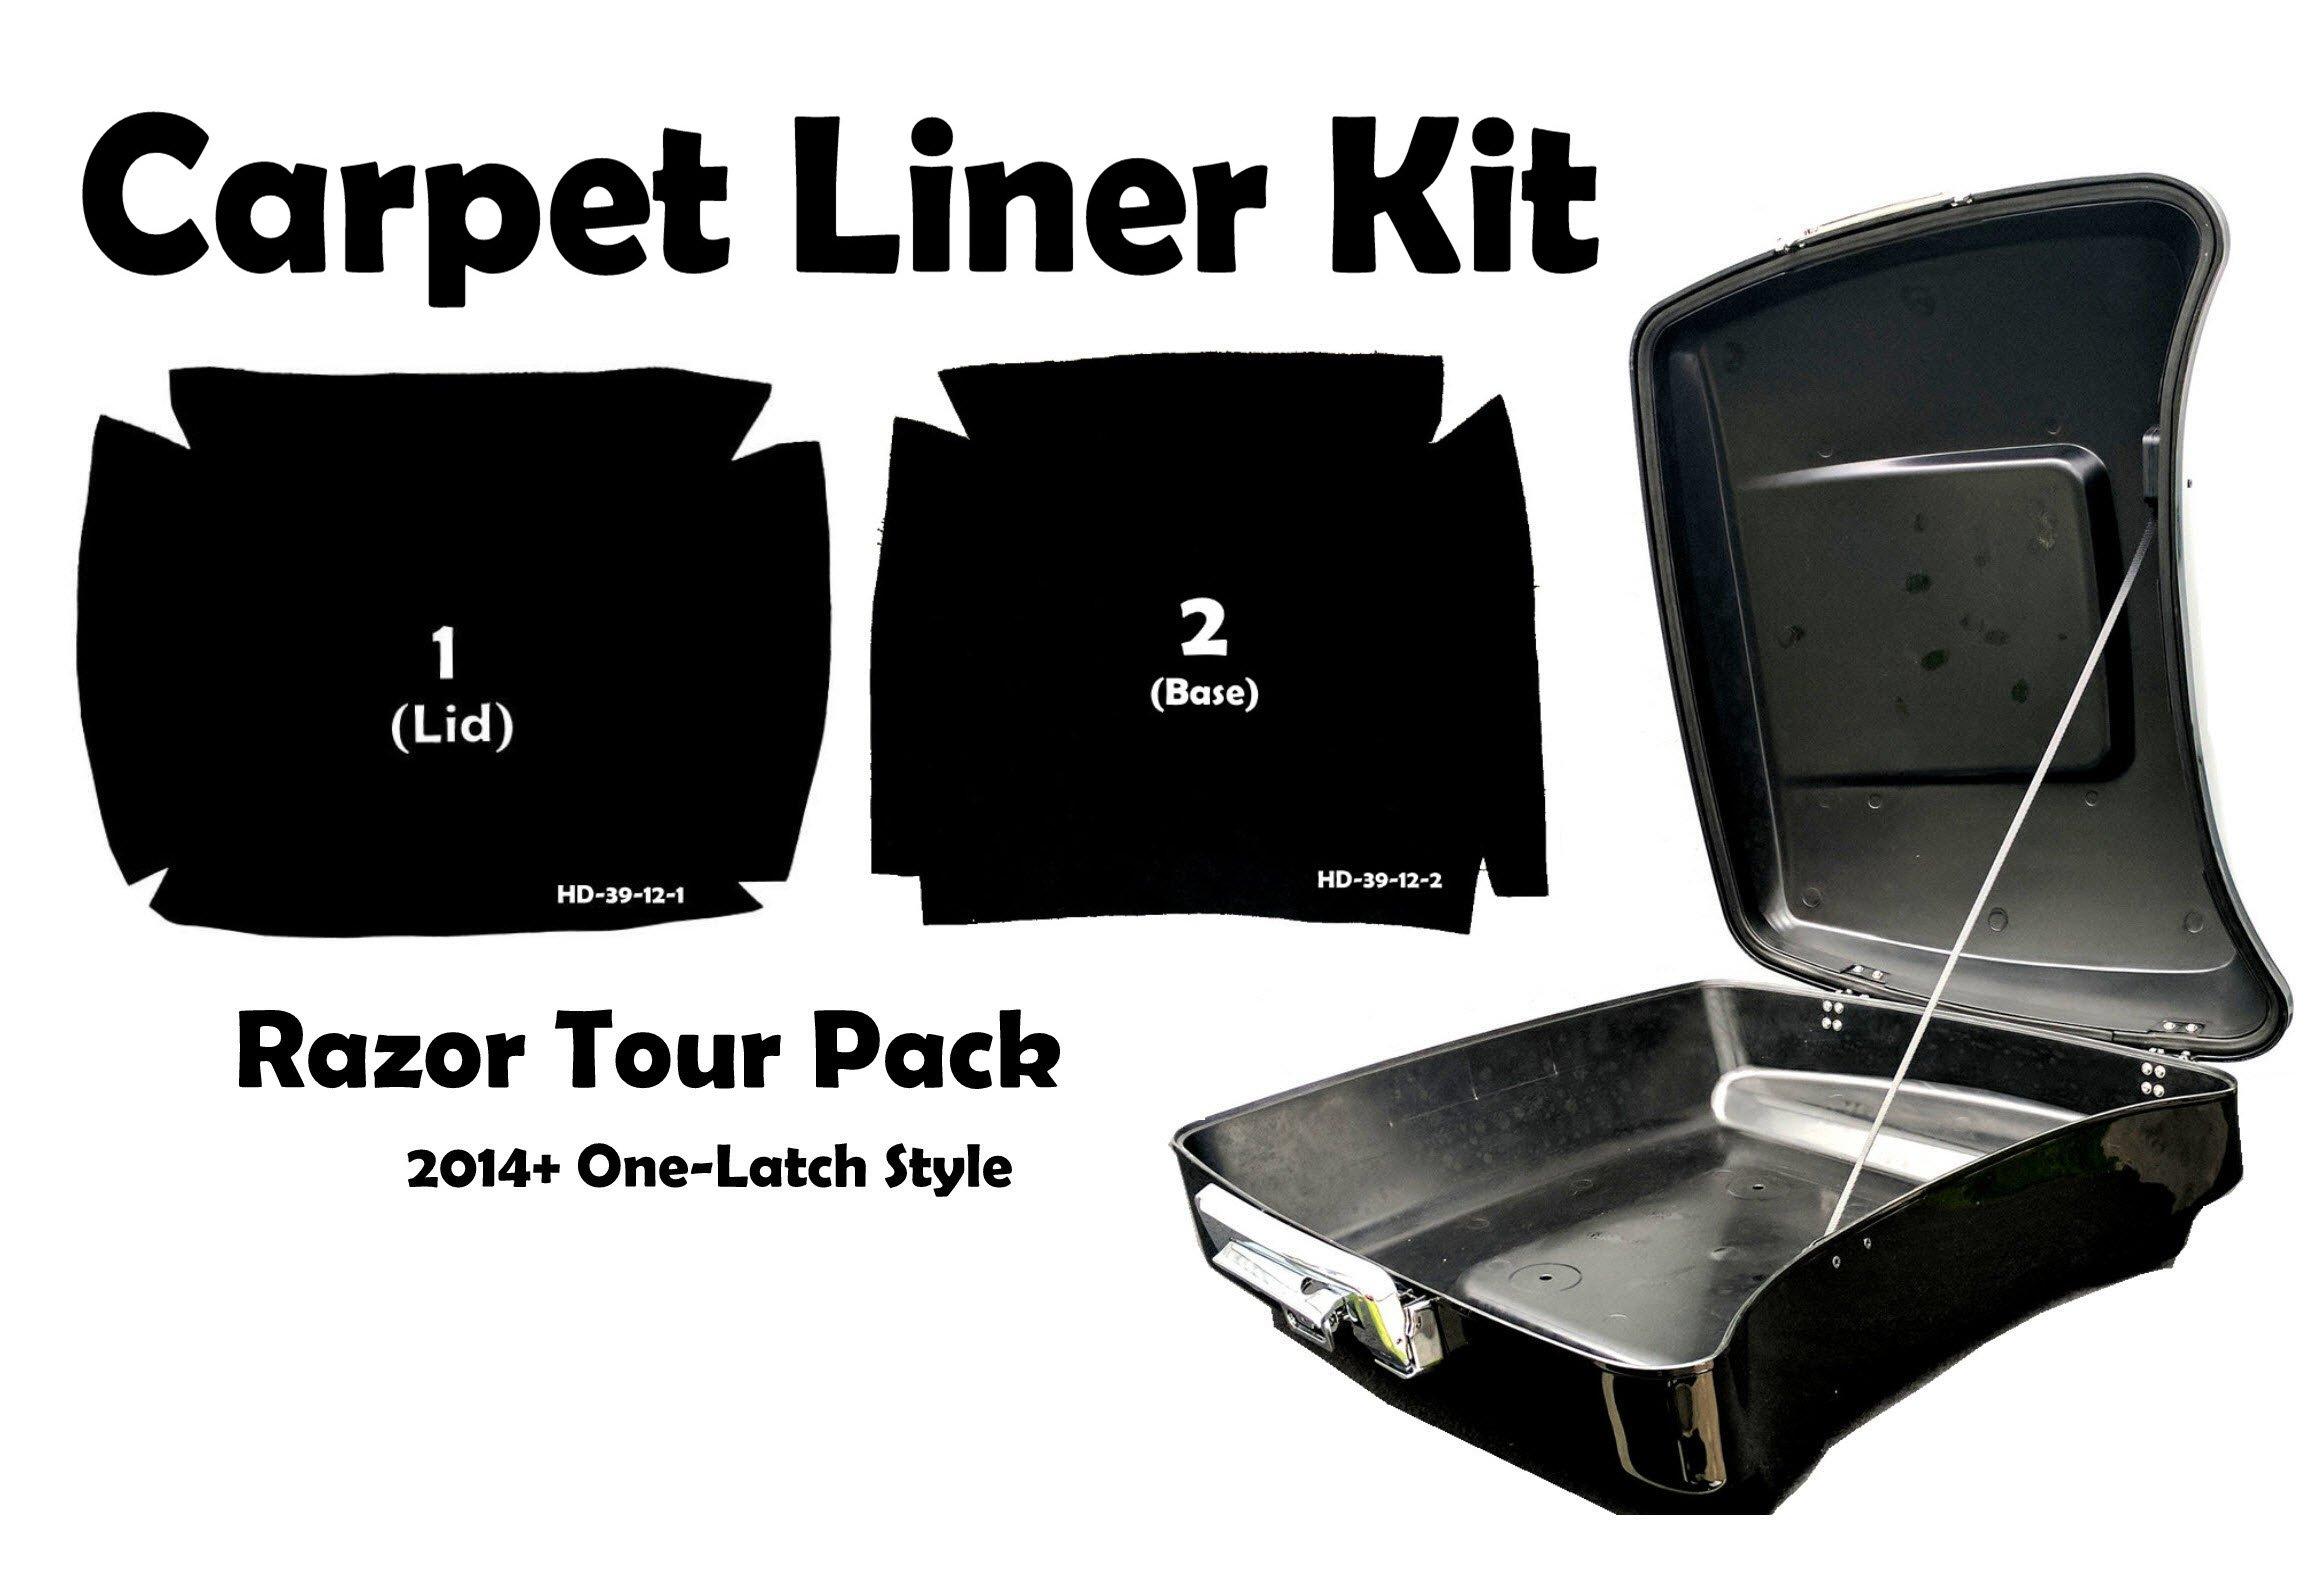 Razor Tour Pack Carpet Liner Kit for 2014-2018 One Latch Style Harley-Davidson Razor Tour Pak (Black)